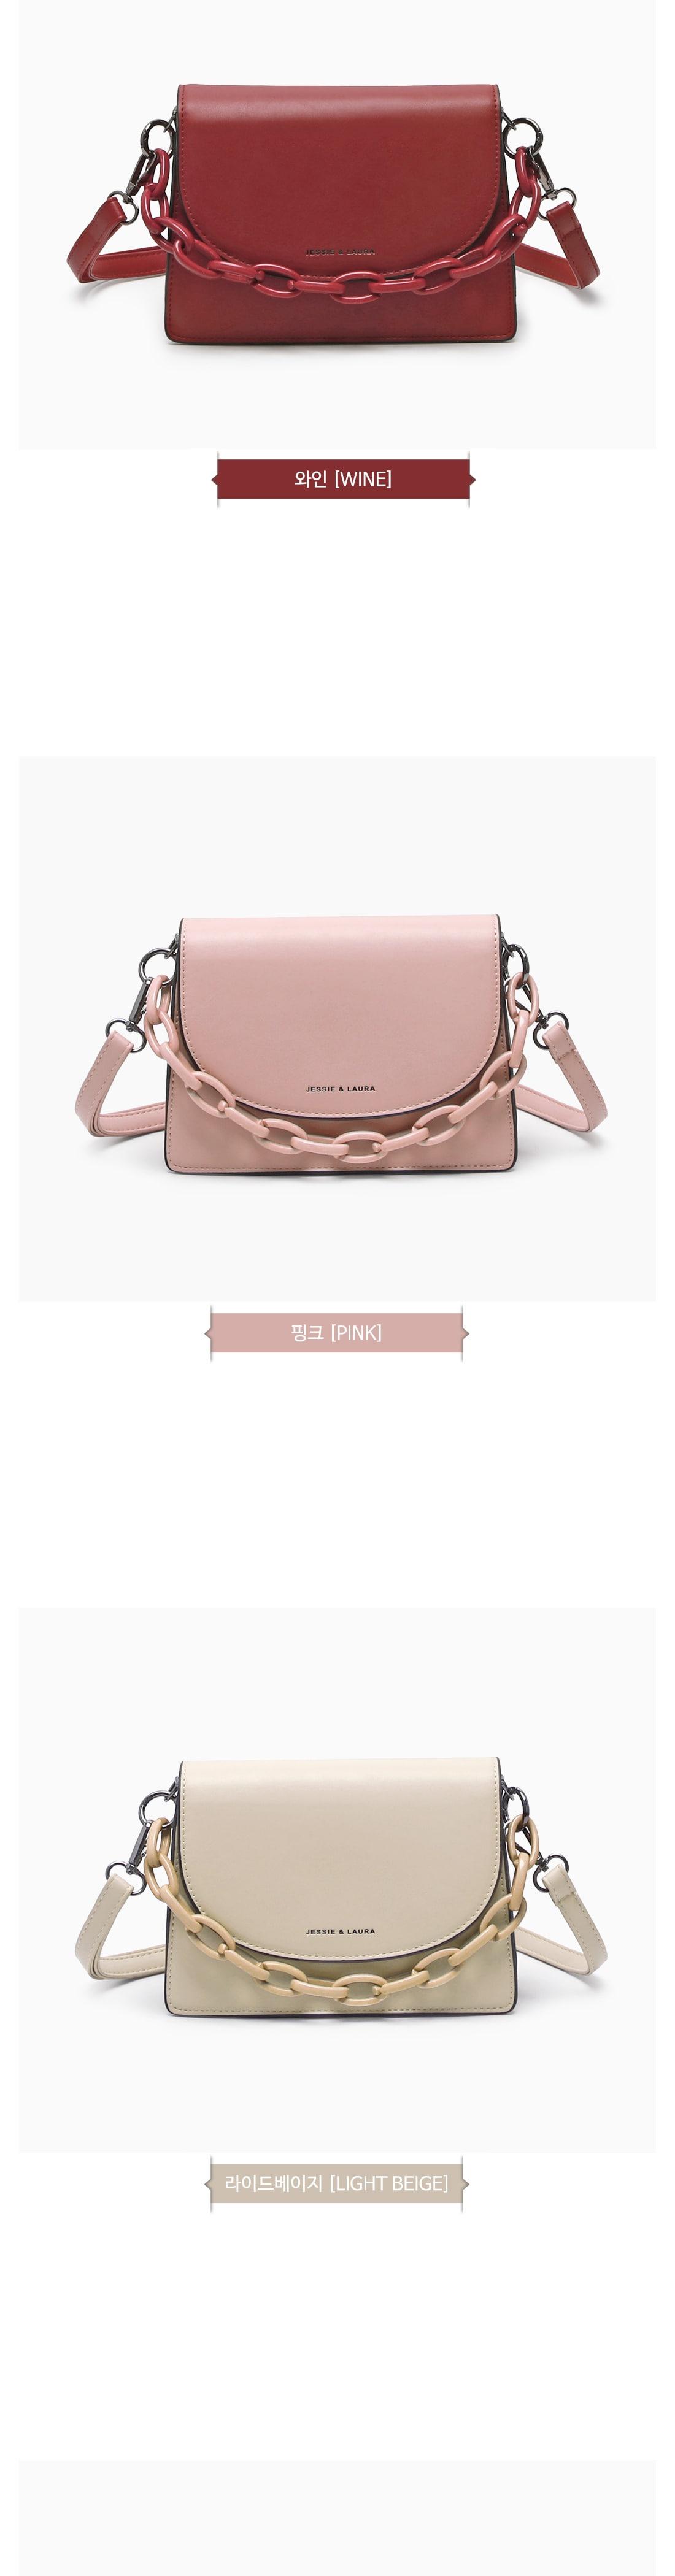 Chain Handle Cross Body Bag-Holiholic